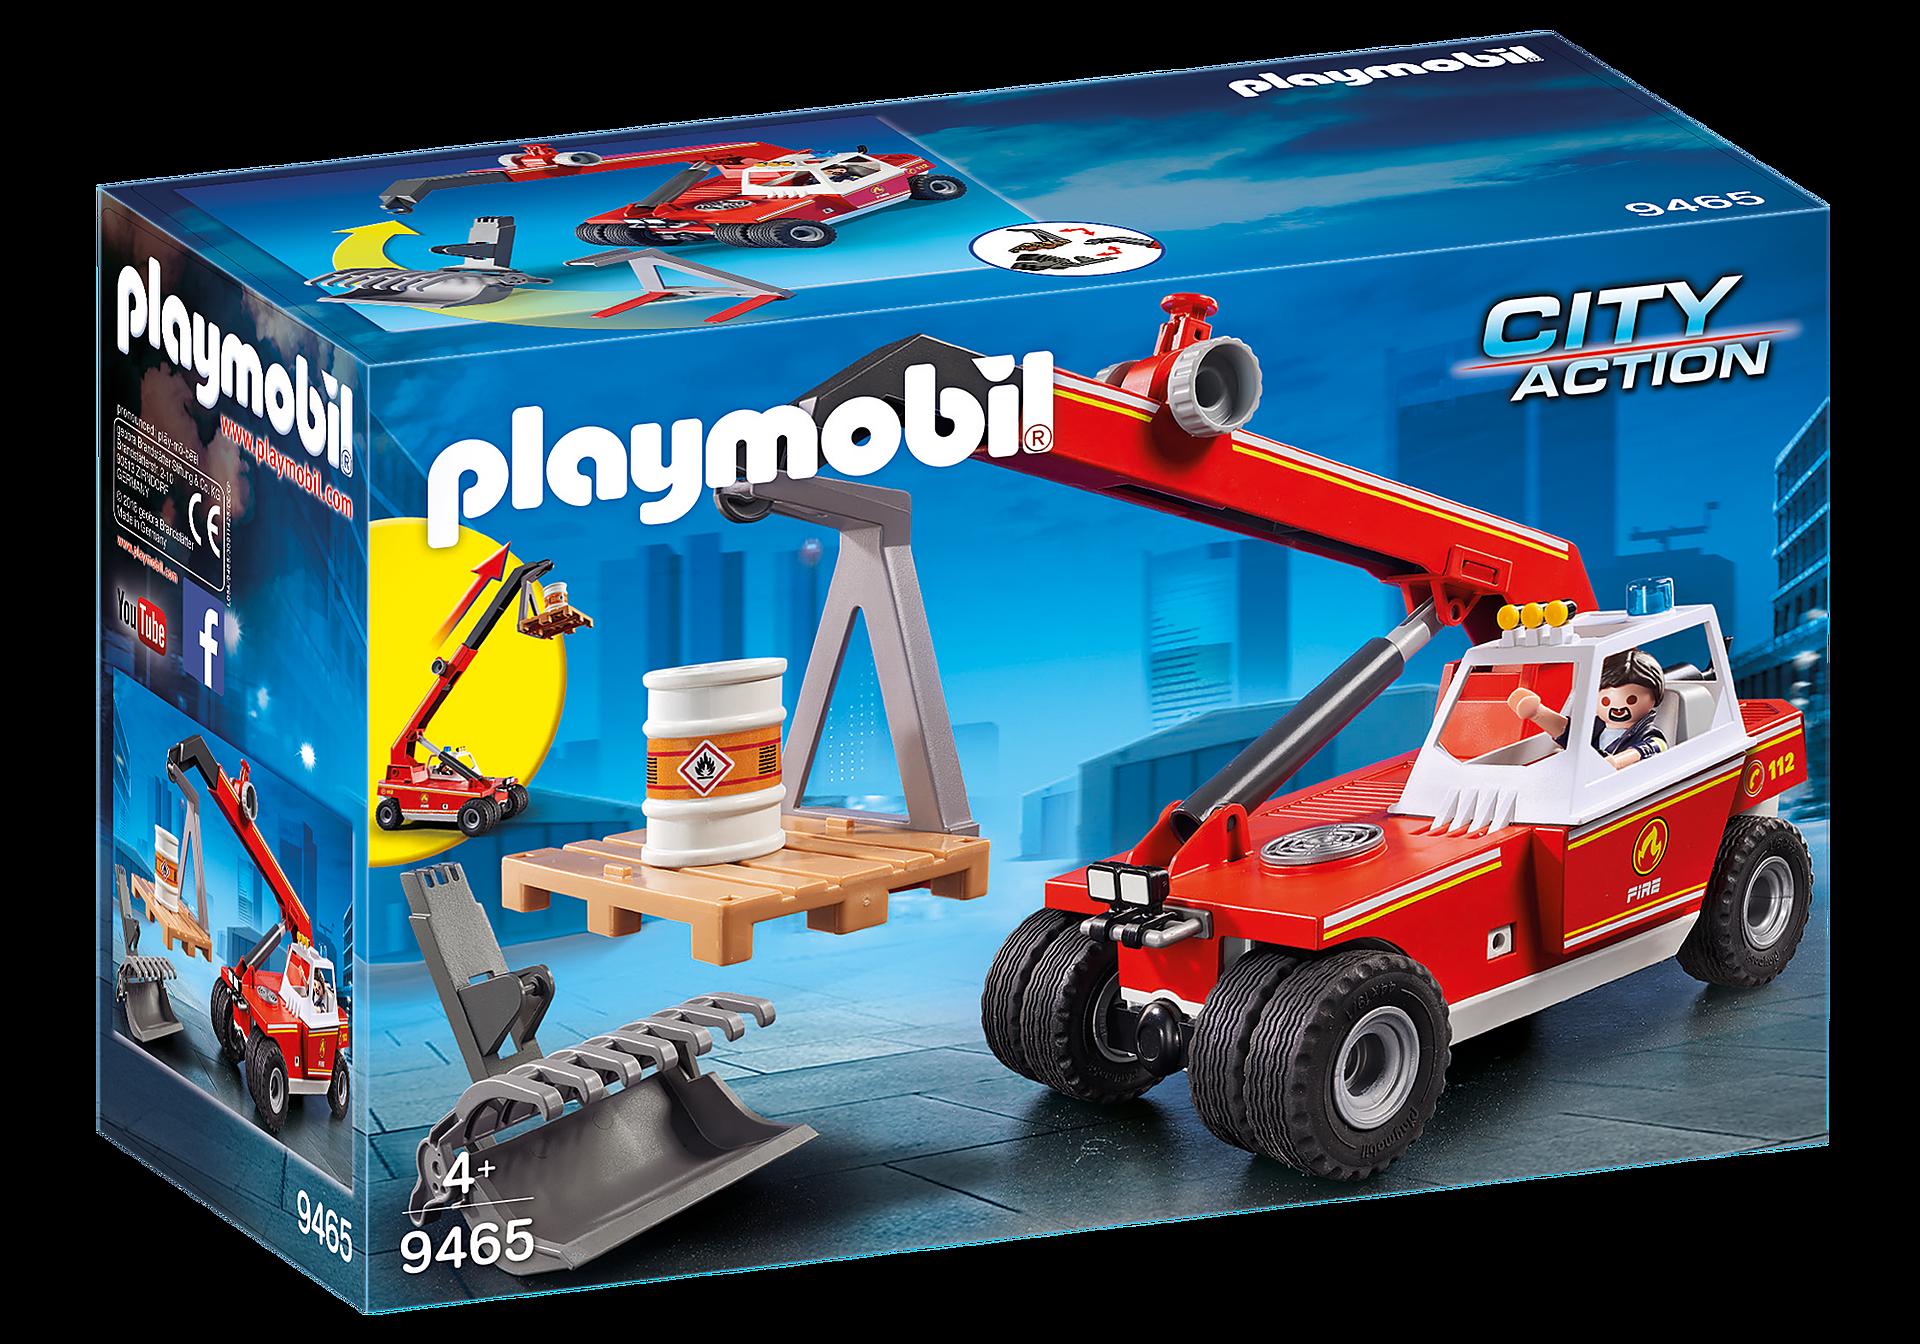 http://media.playmobil.com/i/playmobil/9465_product_box_front/Feuerwehr-Teleskoplader